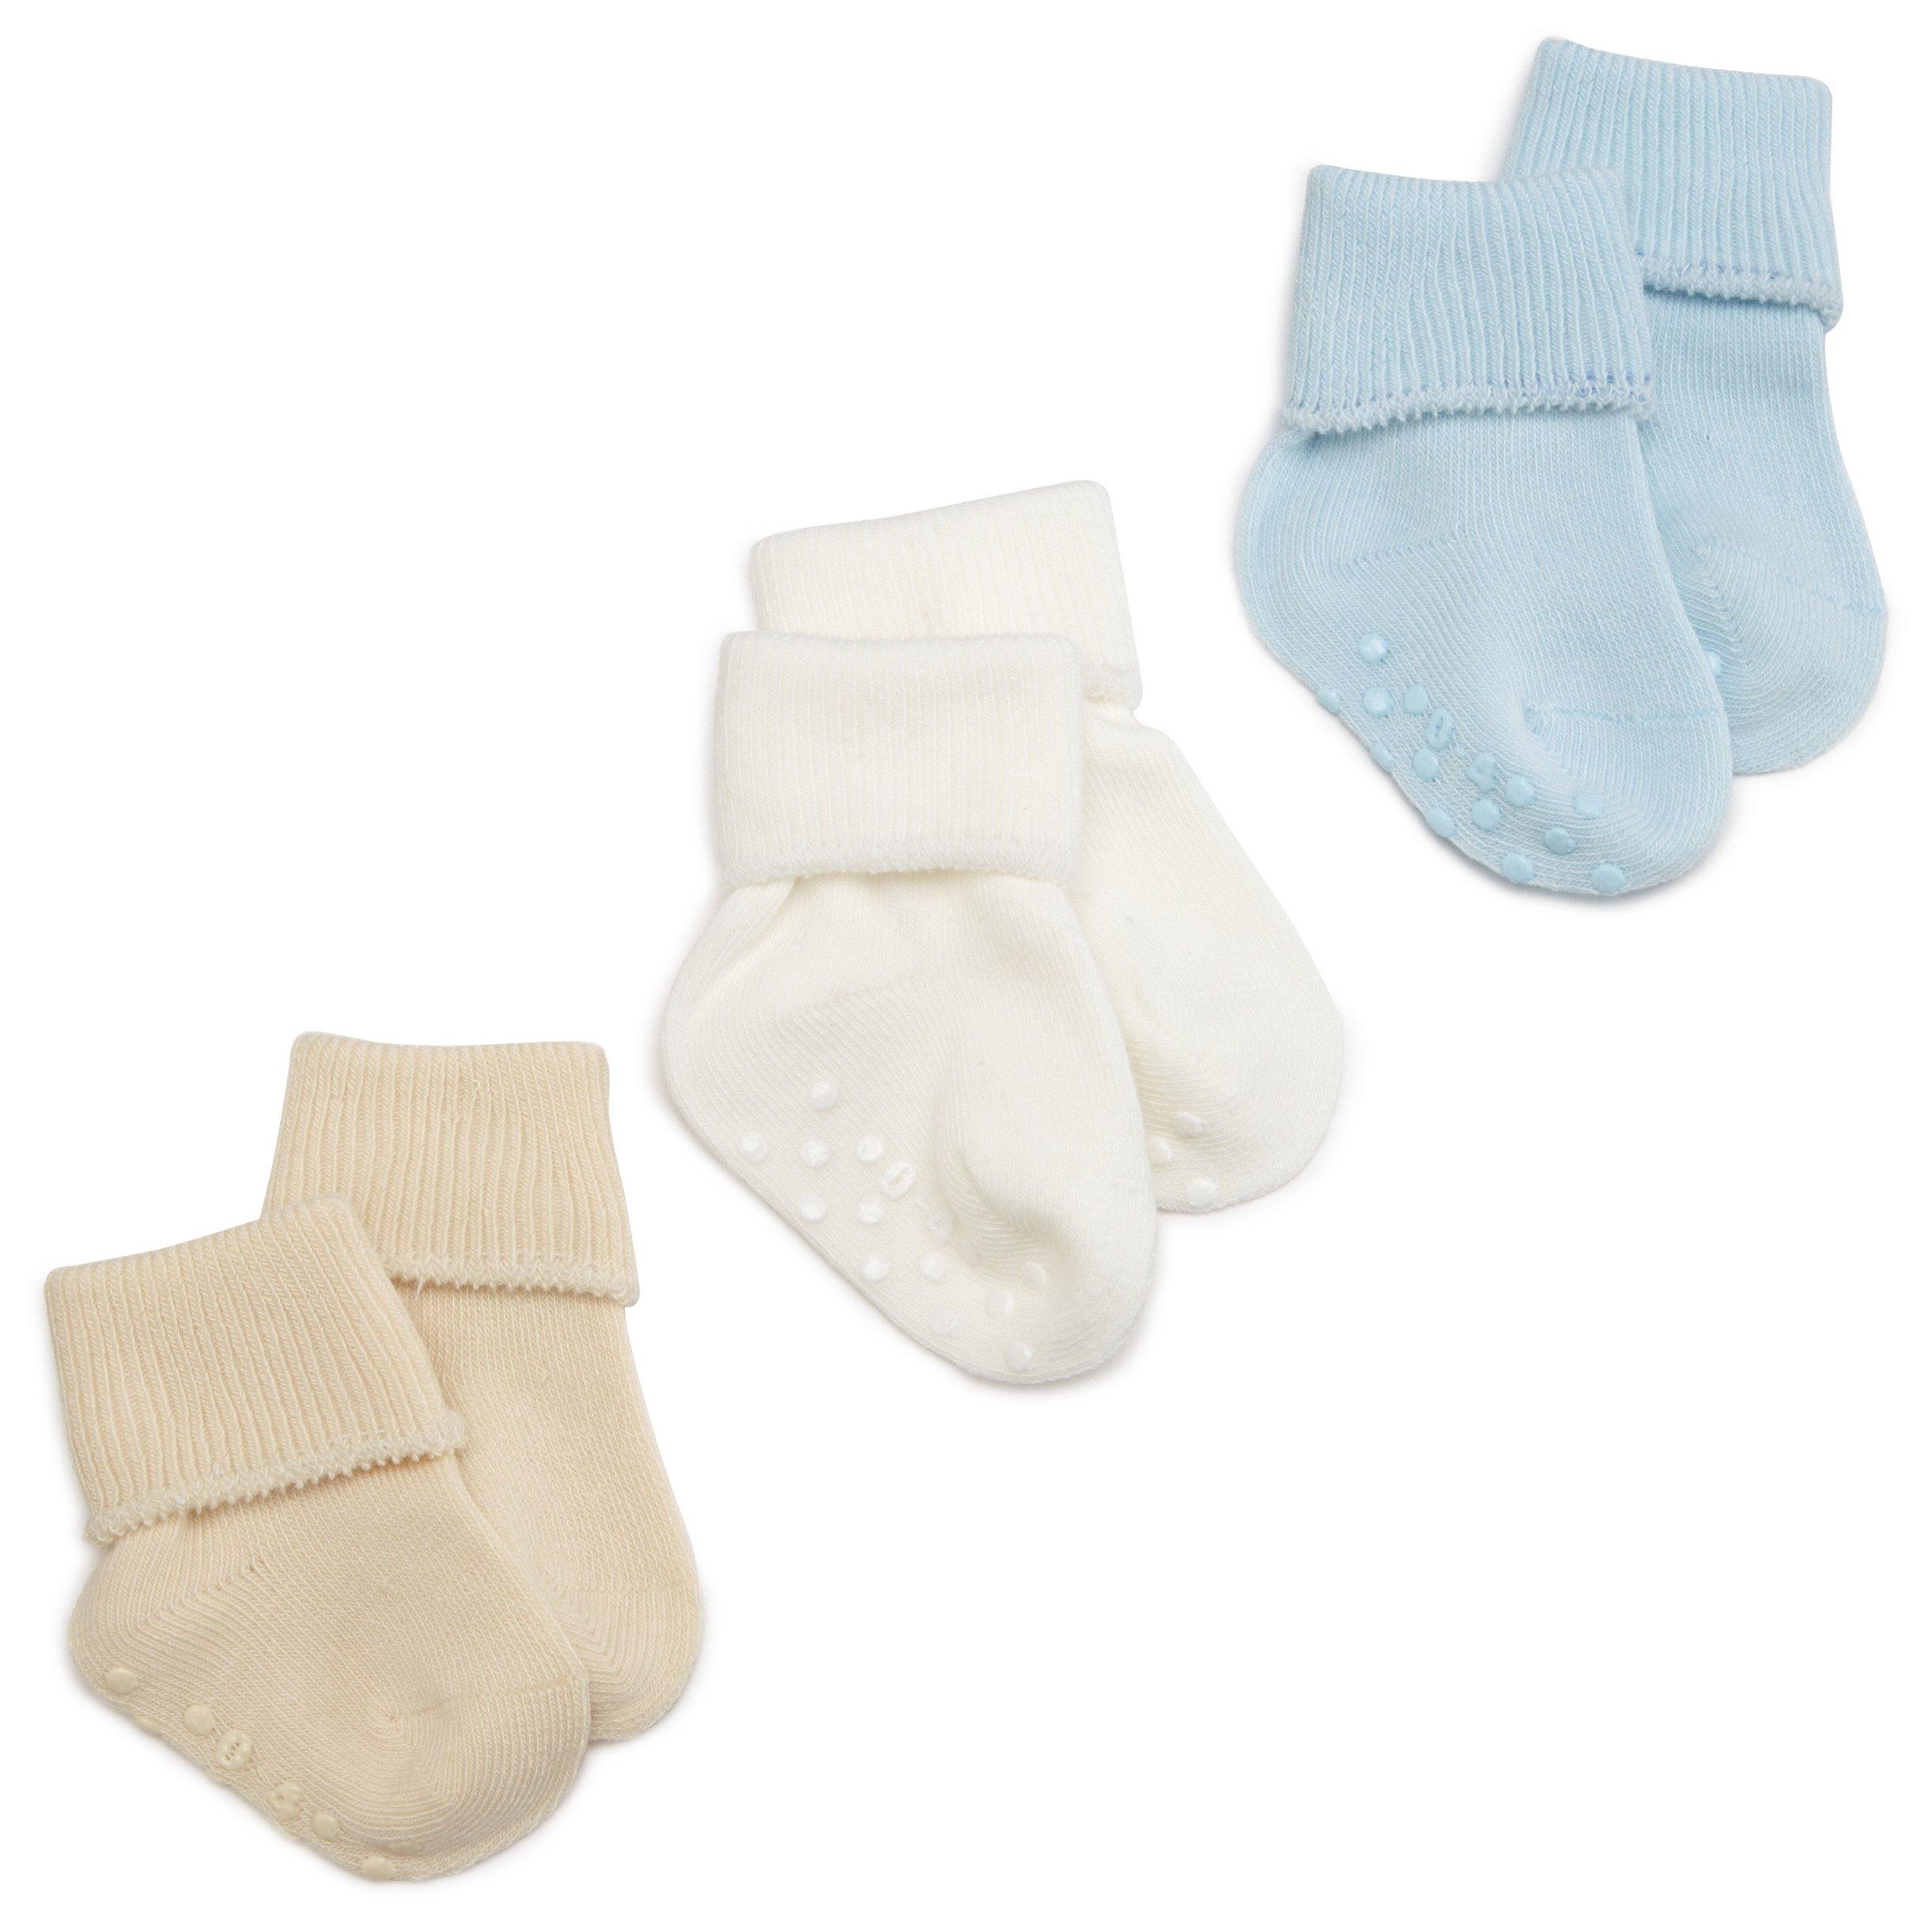 Jefferies Socks Organic Cotton Turn Cuff Sock, 3 Pack, Light Blue/Natural/White